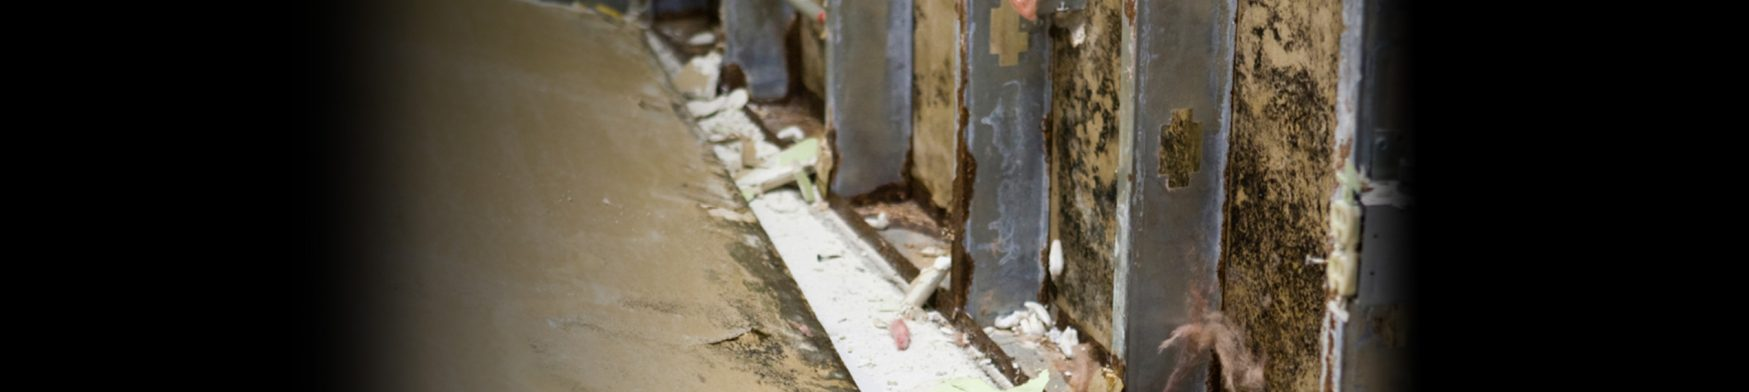 Mold remediation from Paul Davis Restoration of Bowling Green